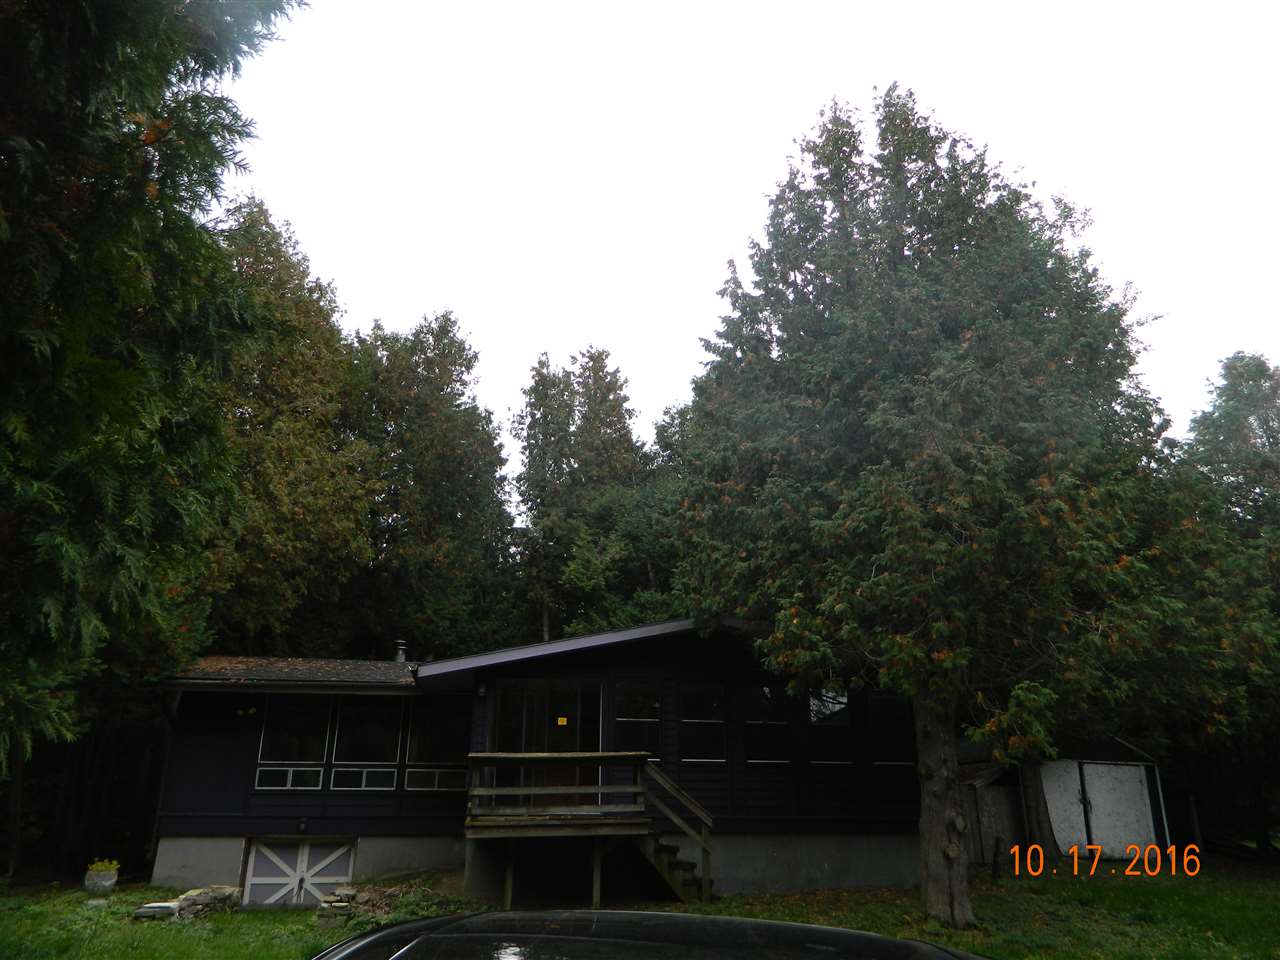 604 Cedar Vale Lane, North Hero, VT 05474